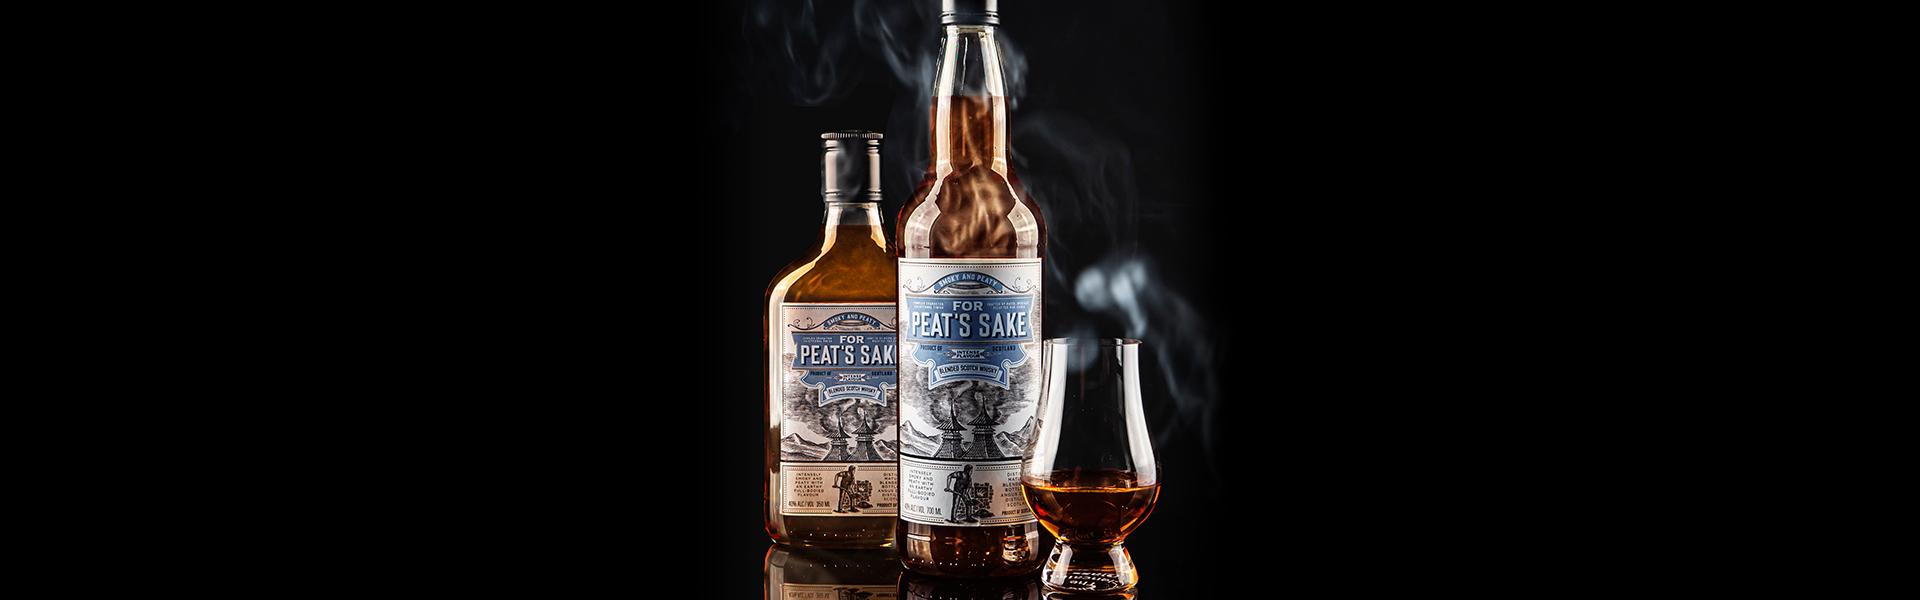 For Peat's Sake – succé för nya whiskyrökaren.